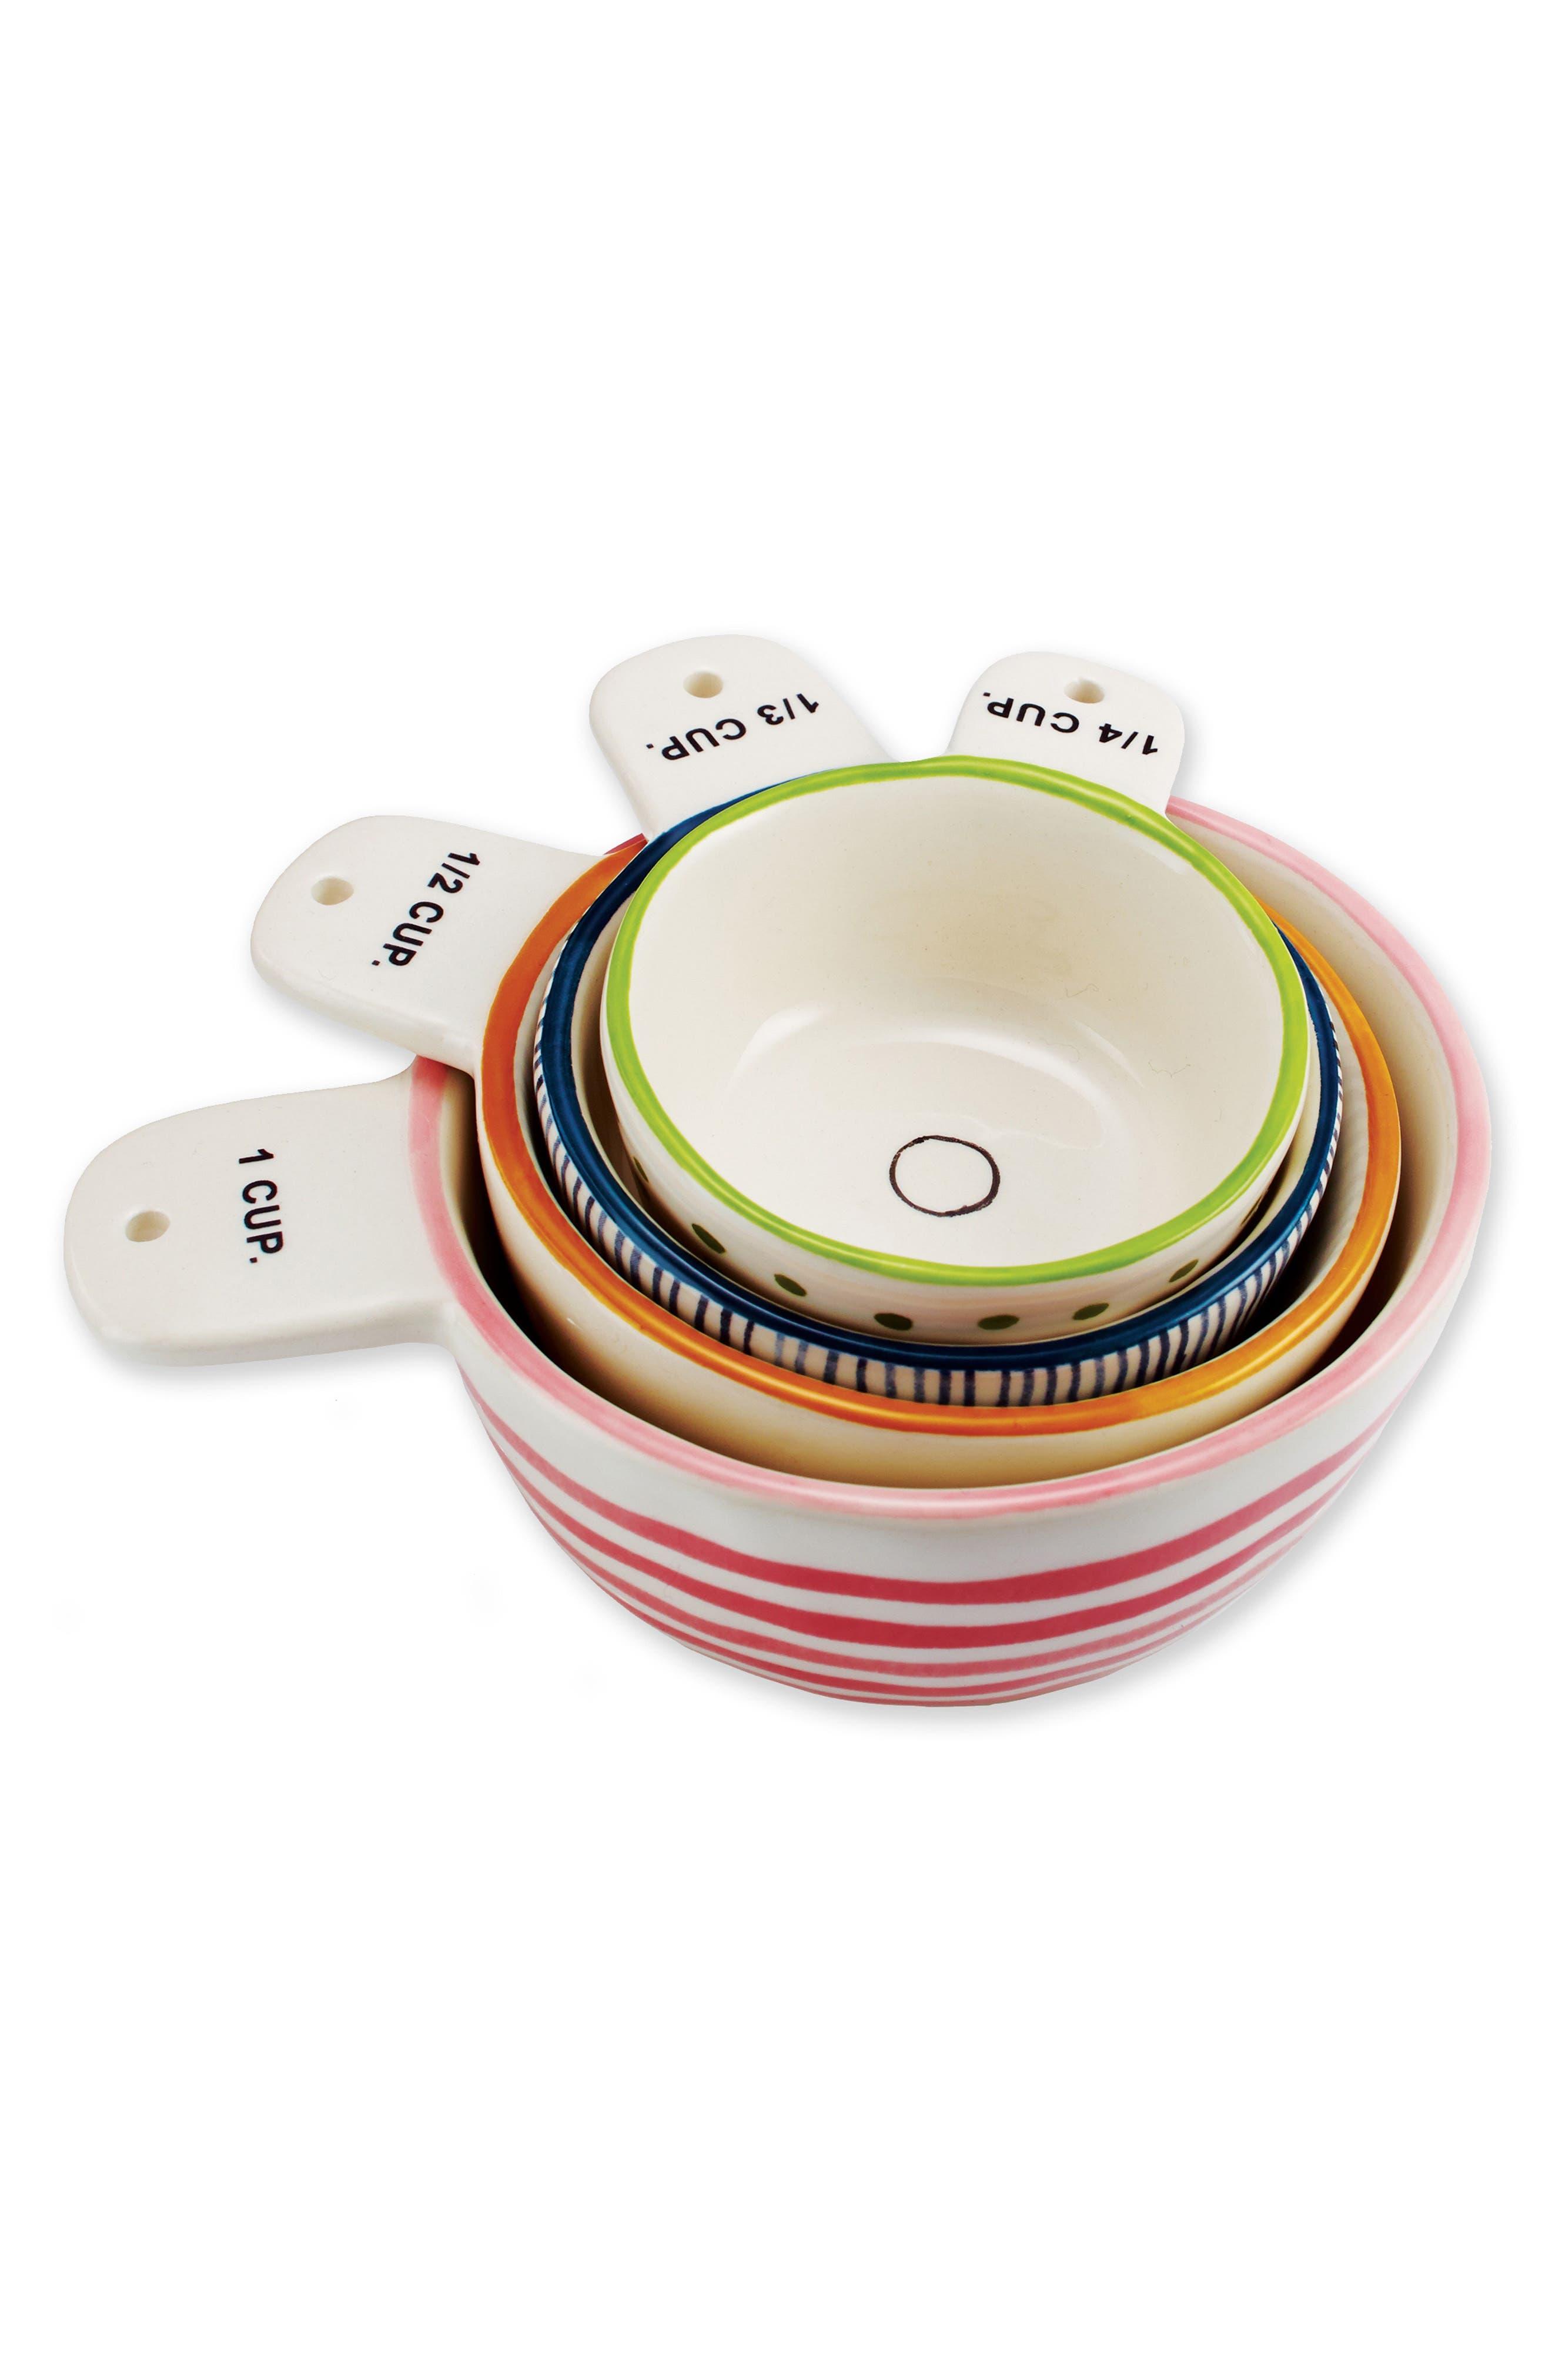 Rae Dunn Set of 4 Ceramic Measuring Cups